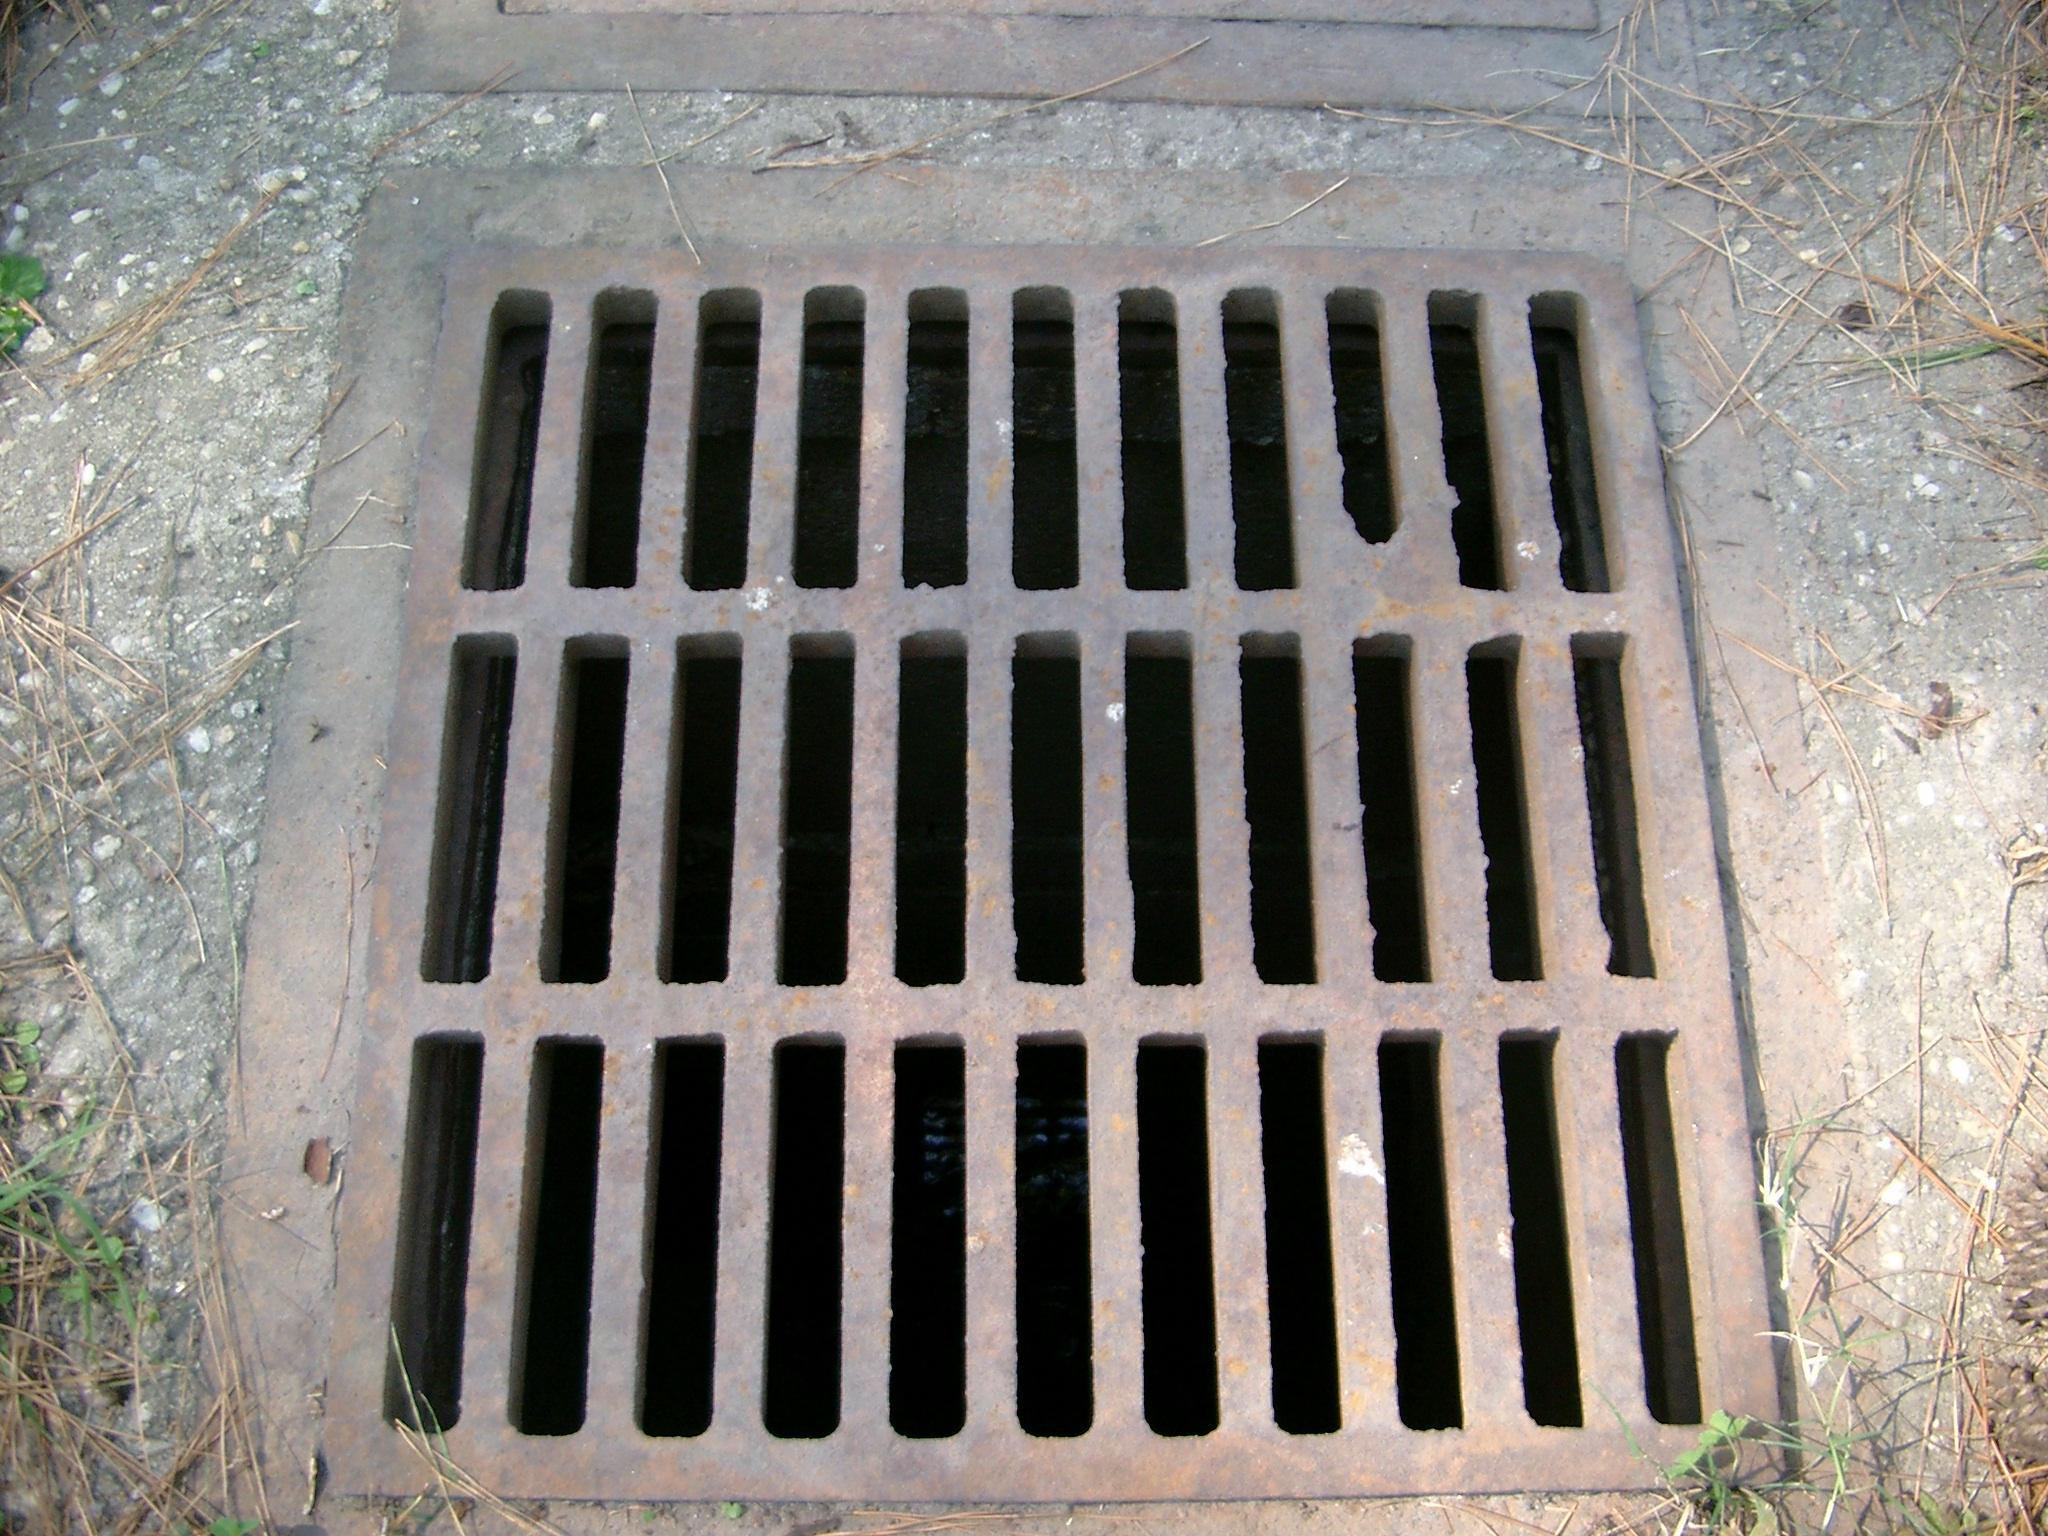 Sewer_Grate_01.jpg